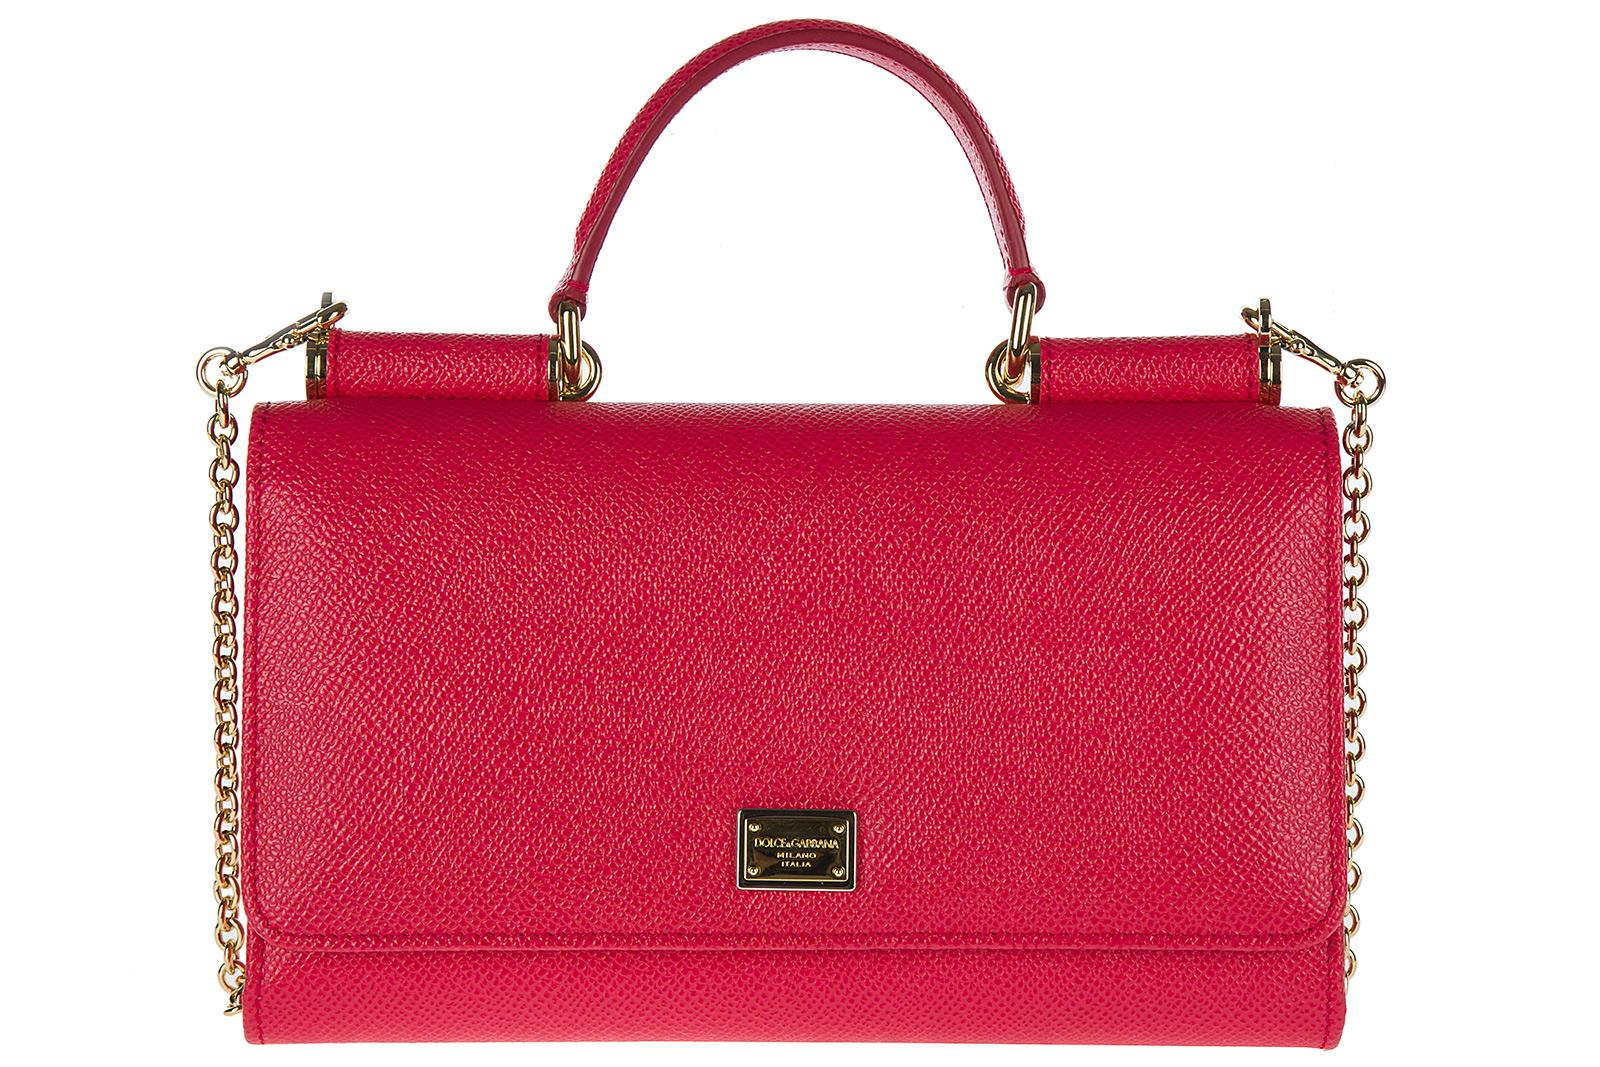 Dolce & Gabbana Satchel Bags - Sicily Media St. Dauphine+Ricamo Royal - - Satchel Bags for ladies Largest Supplier Online M3noAj